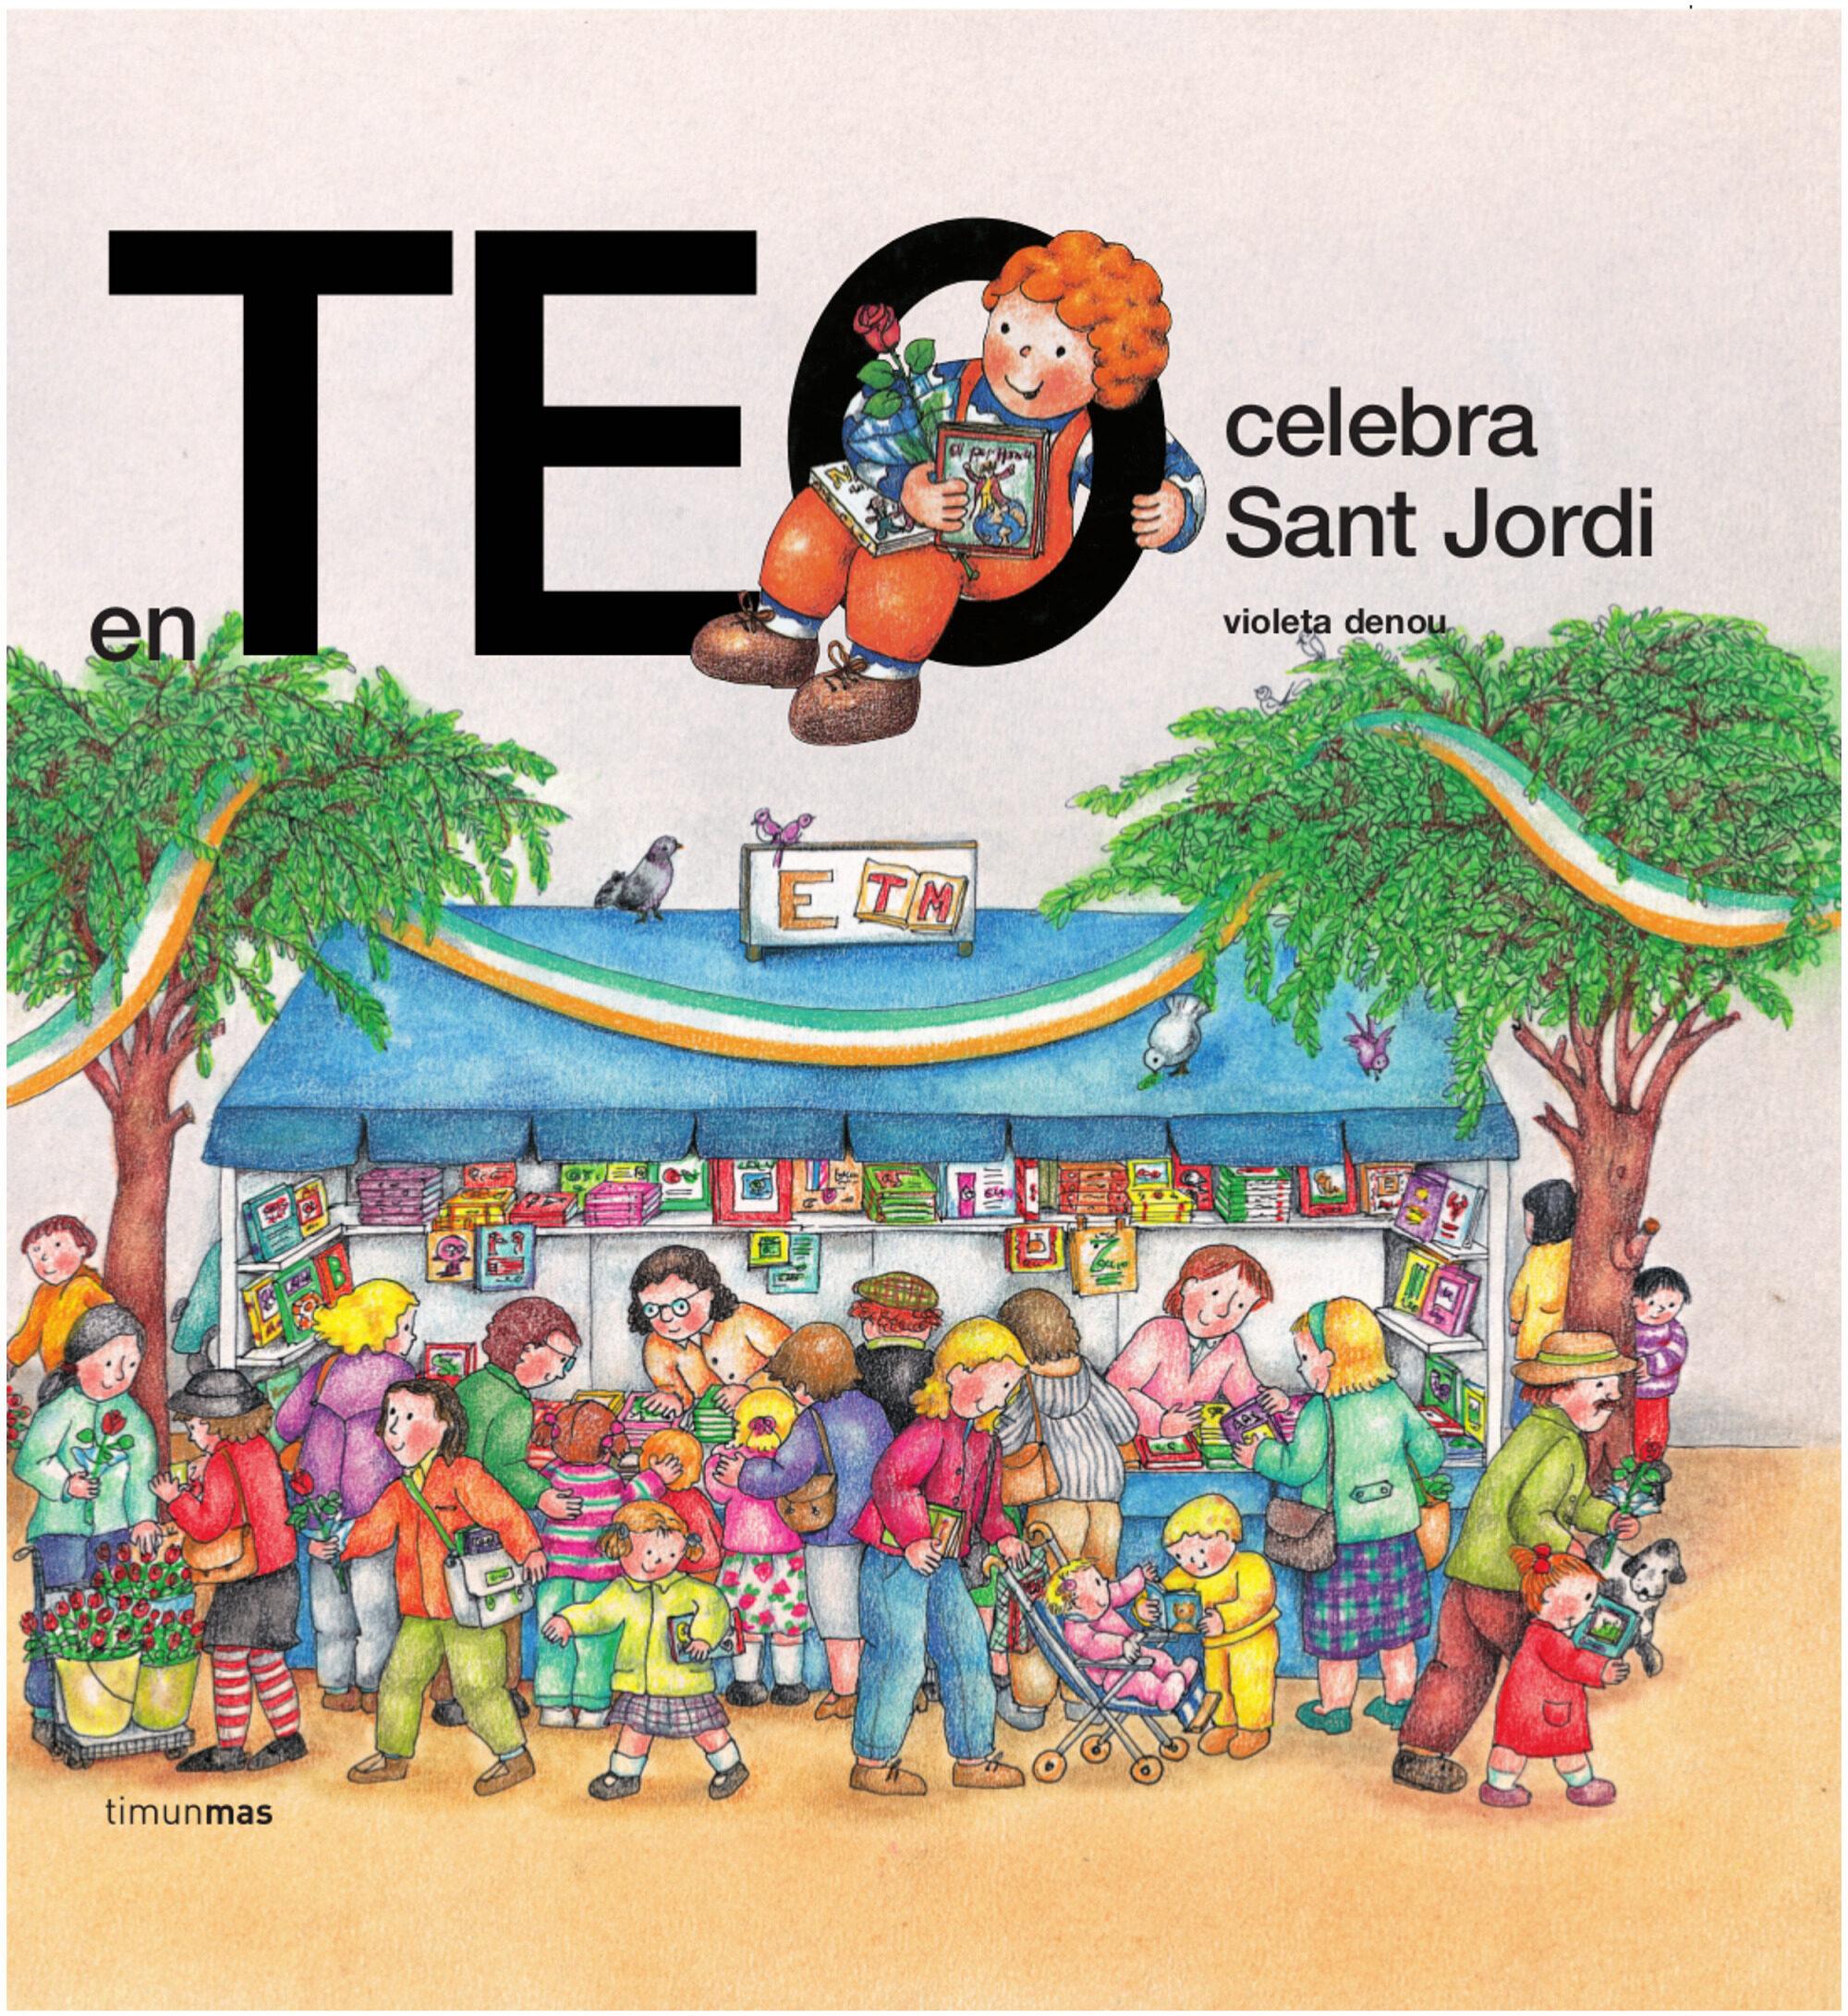 En Teo Celebra Sant Jordi Violeta Denou Comprar Libro 9788499324579